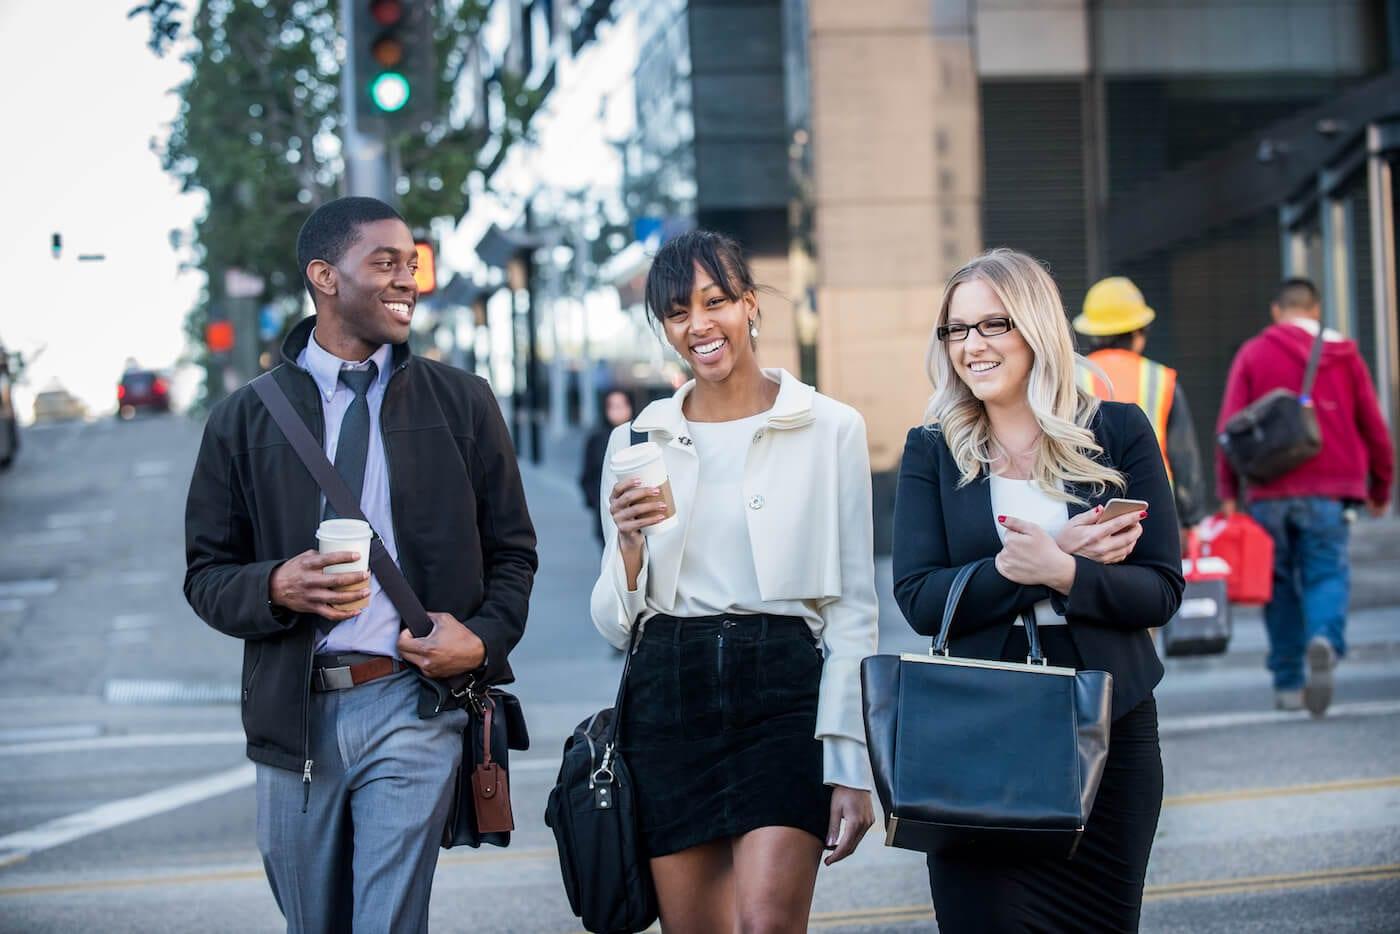 LA-Intern-Student-Intern-Housing-group-walking